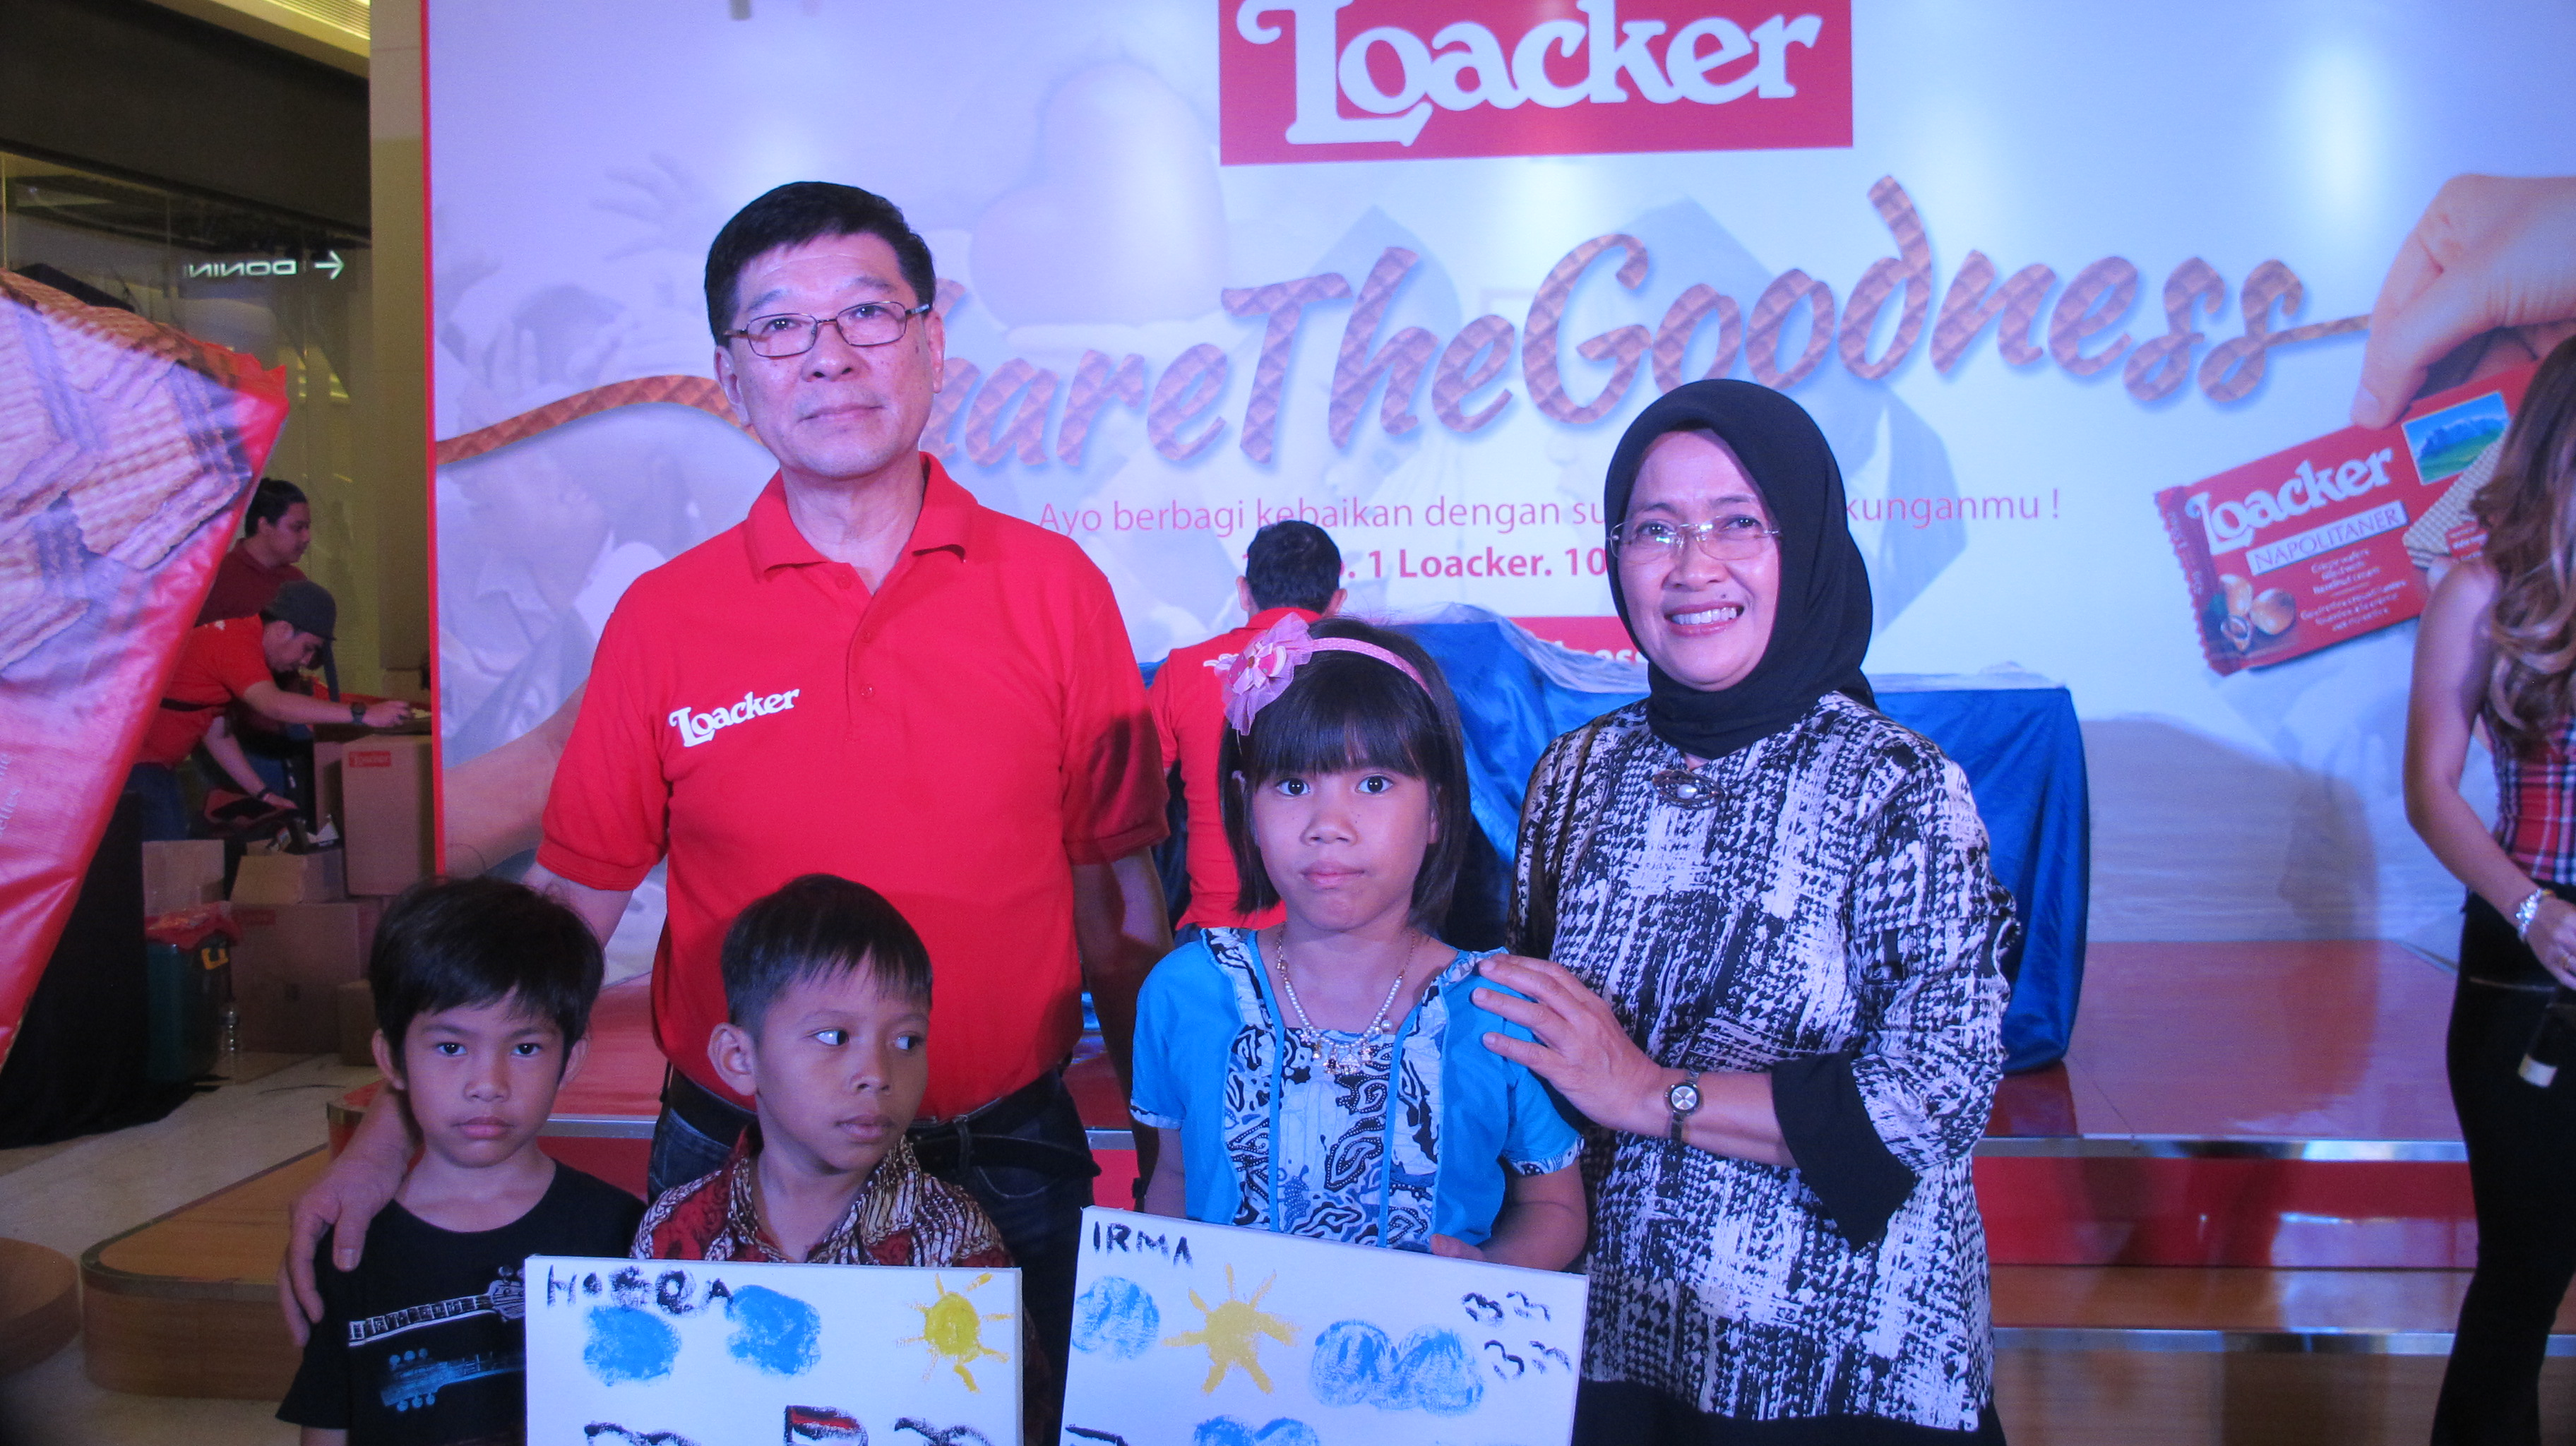 SHARE THE GOODNESS FROM LOACKER TO SAYAP IBU JAKARTA